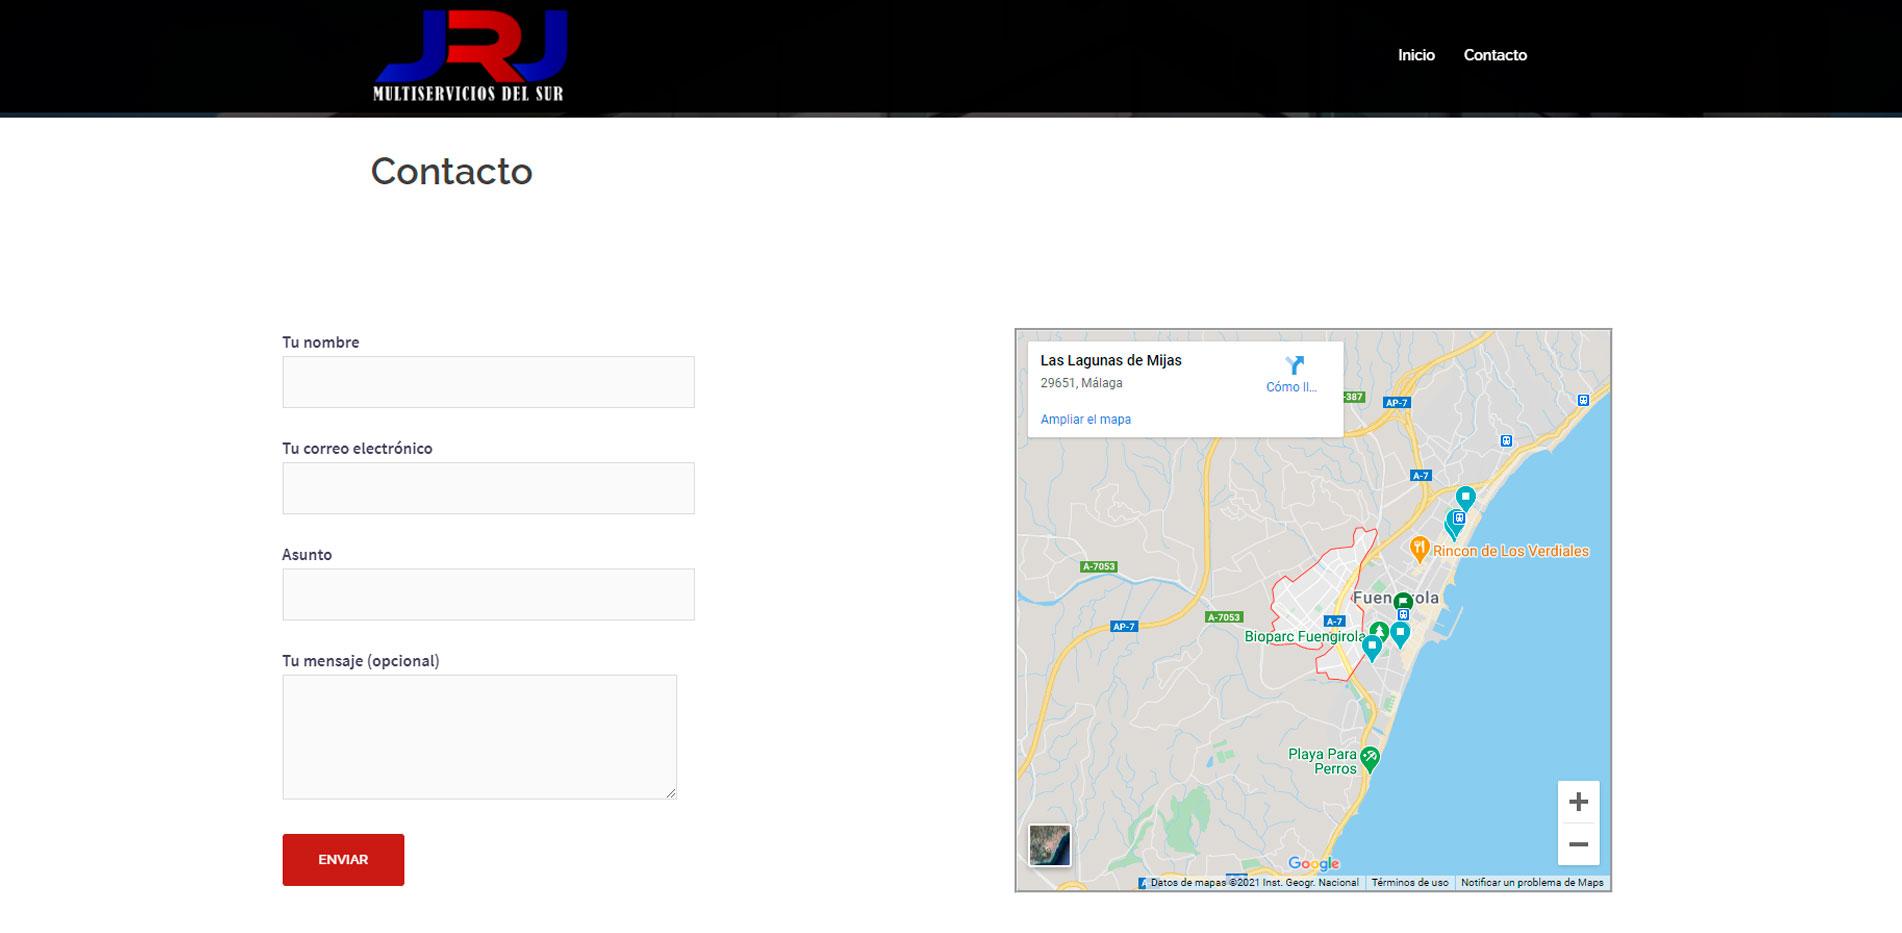 Captura-de-pantalla-MultiserviciosJRJ-4-1902x933